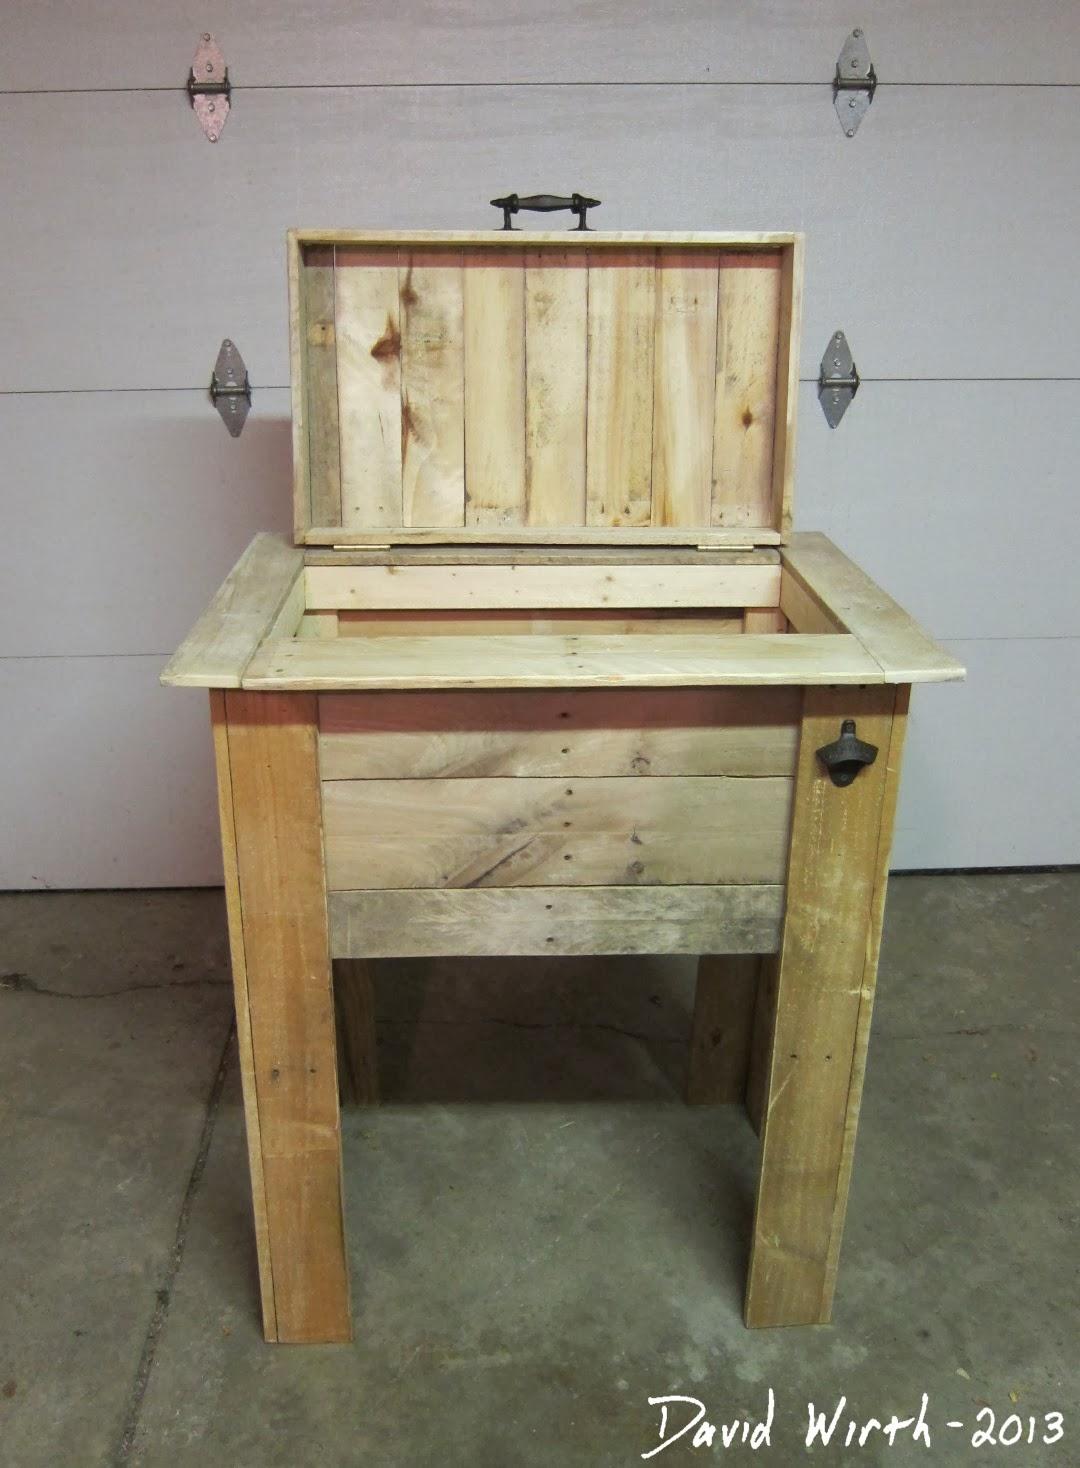 Wood Patio Cooler Plans: Rustic Outdoor Cooler Stand